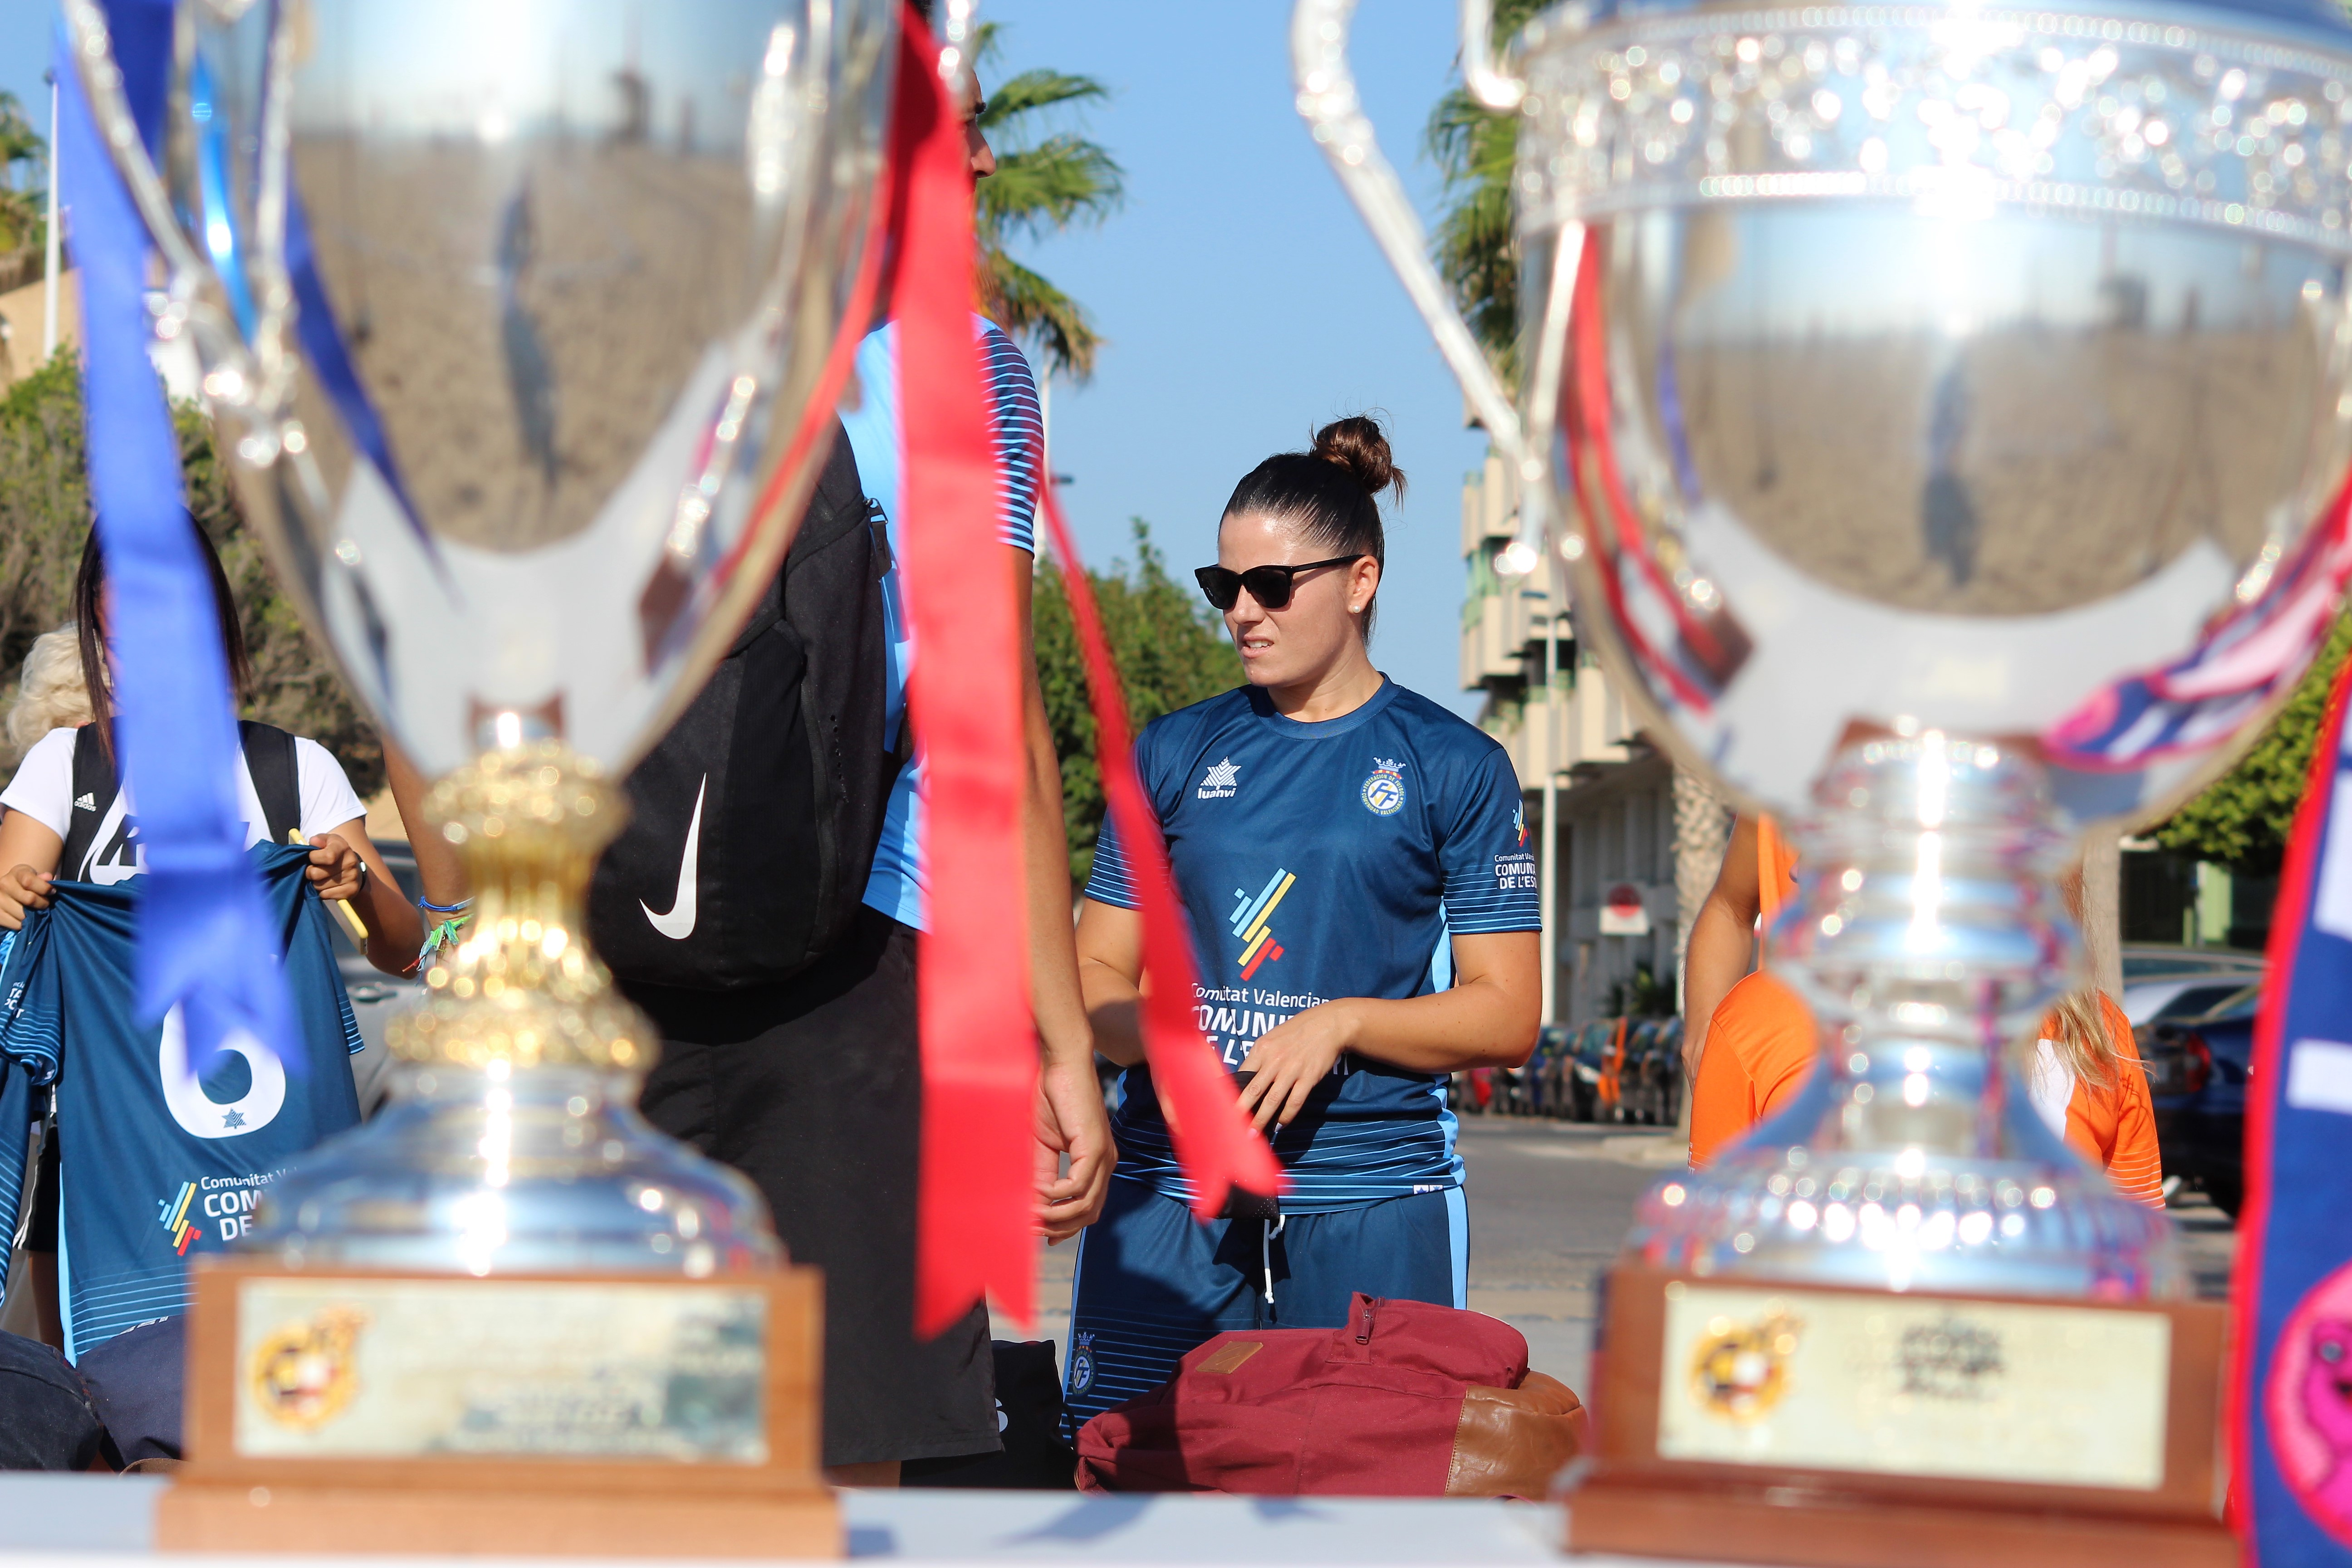 31 agosto - Clausura temporada fútbol playa en Patacona